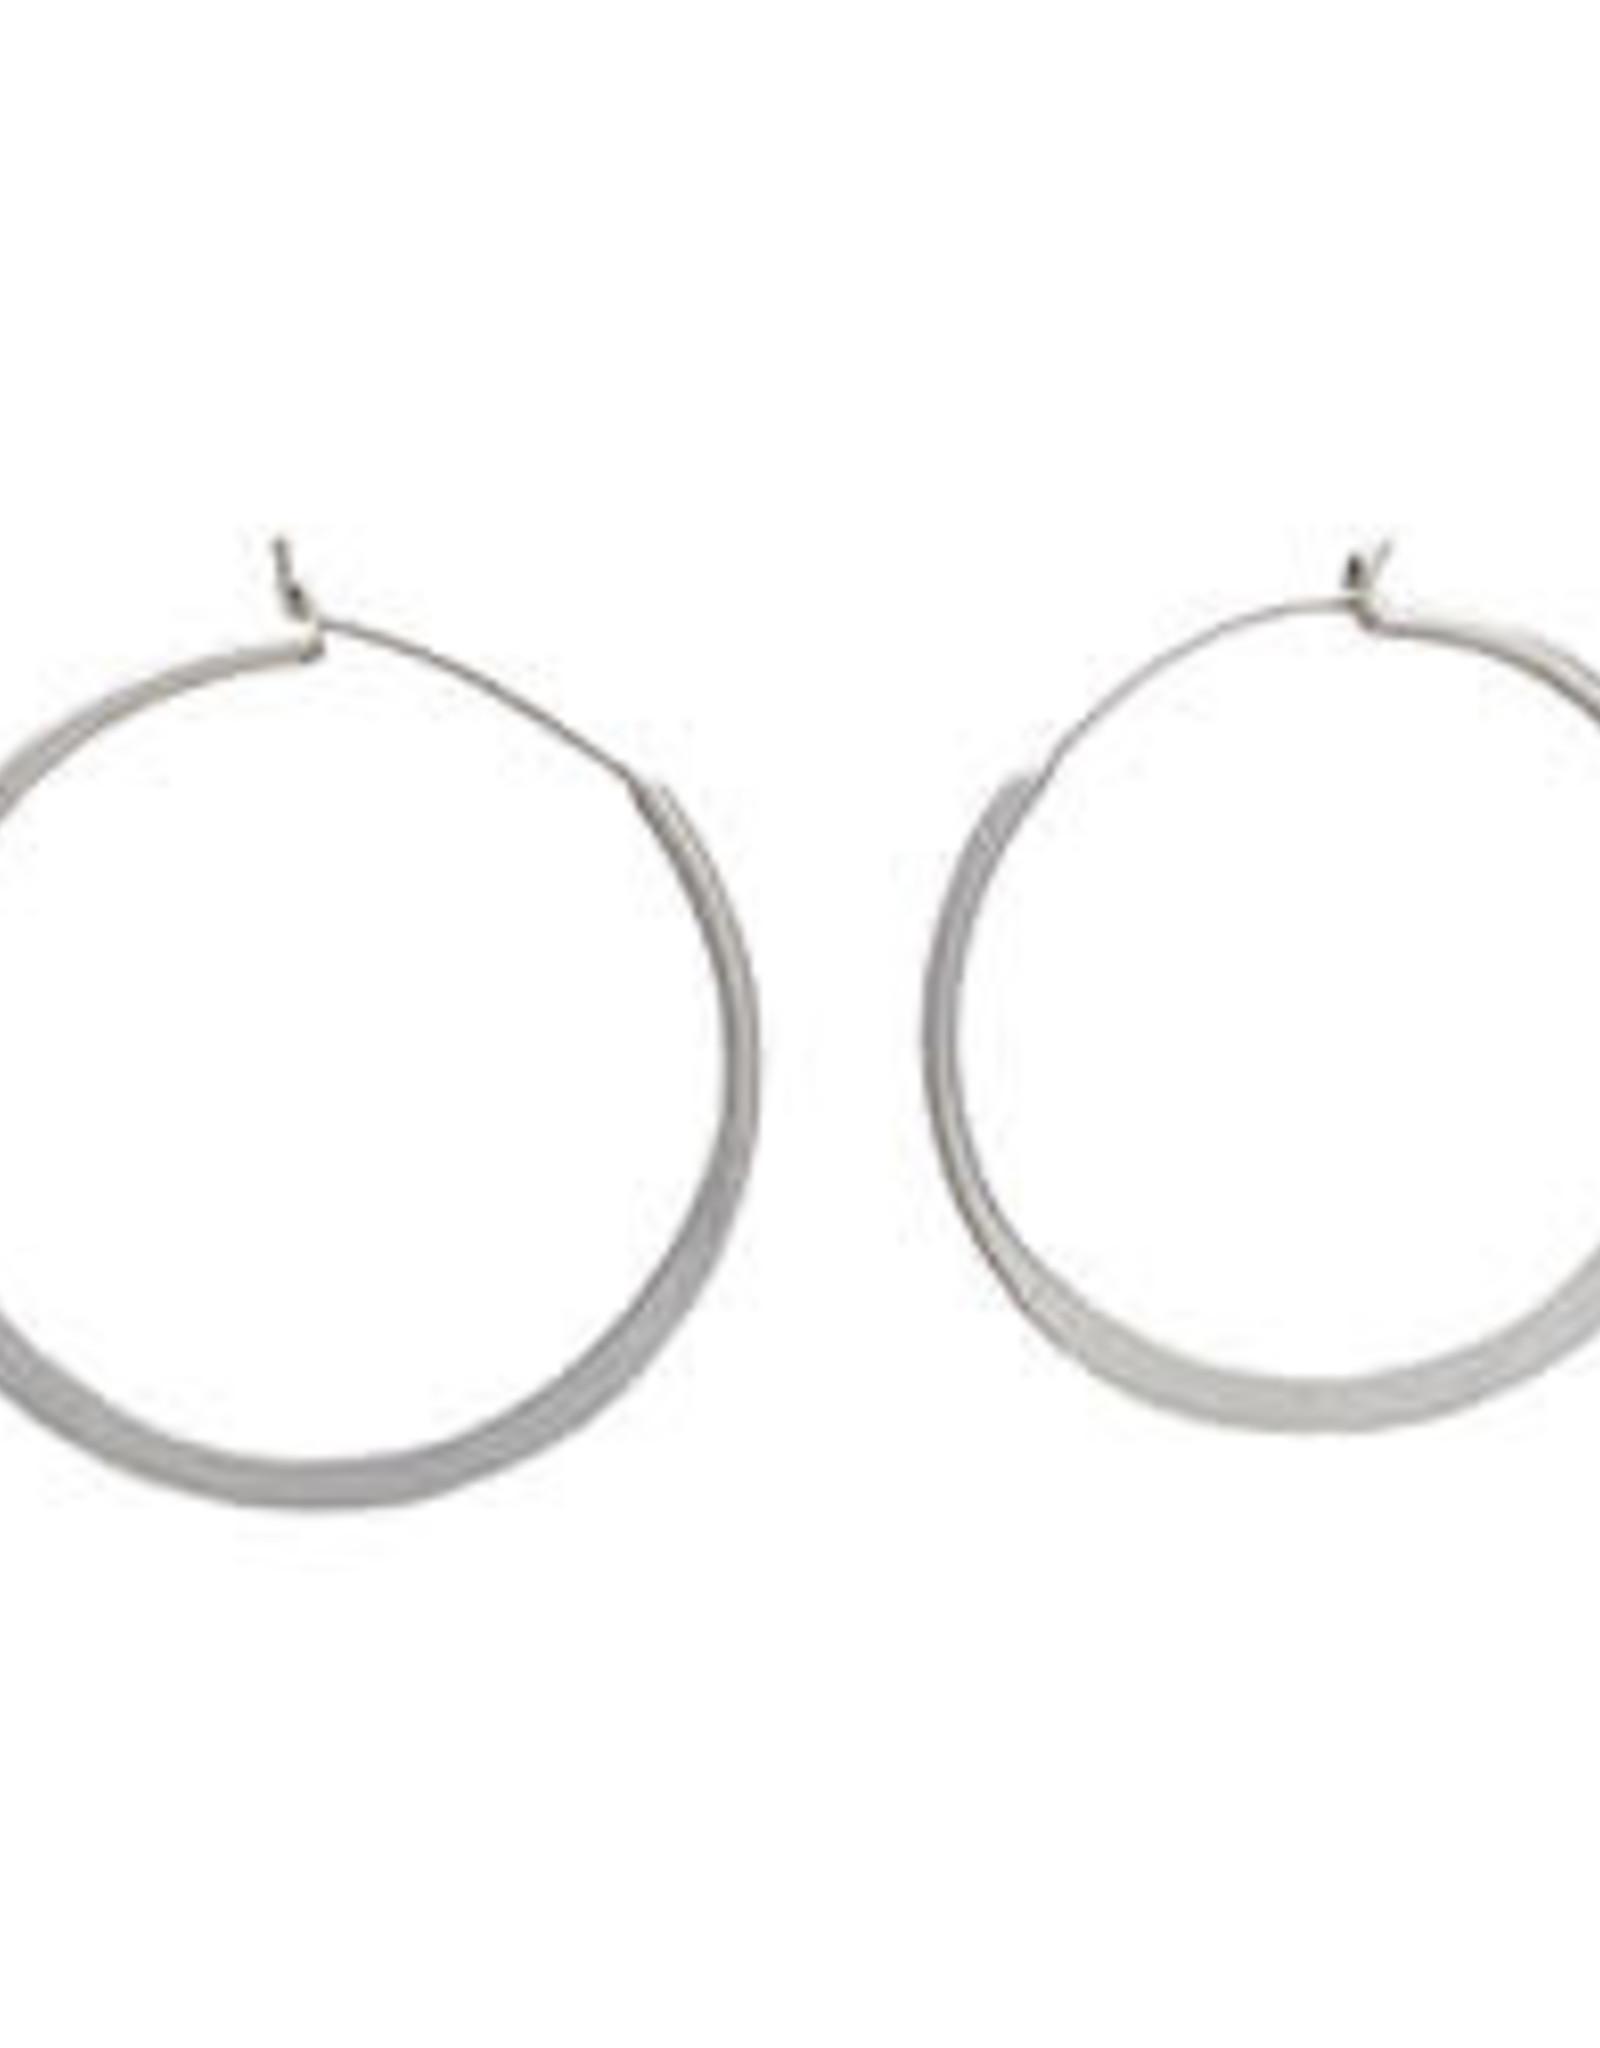 Organic Hoops - Silver